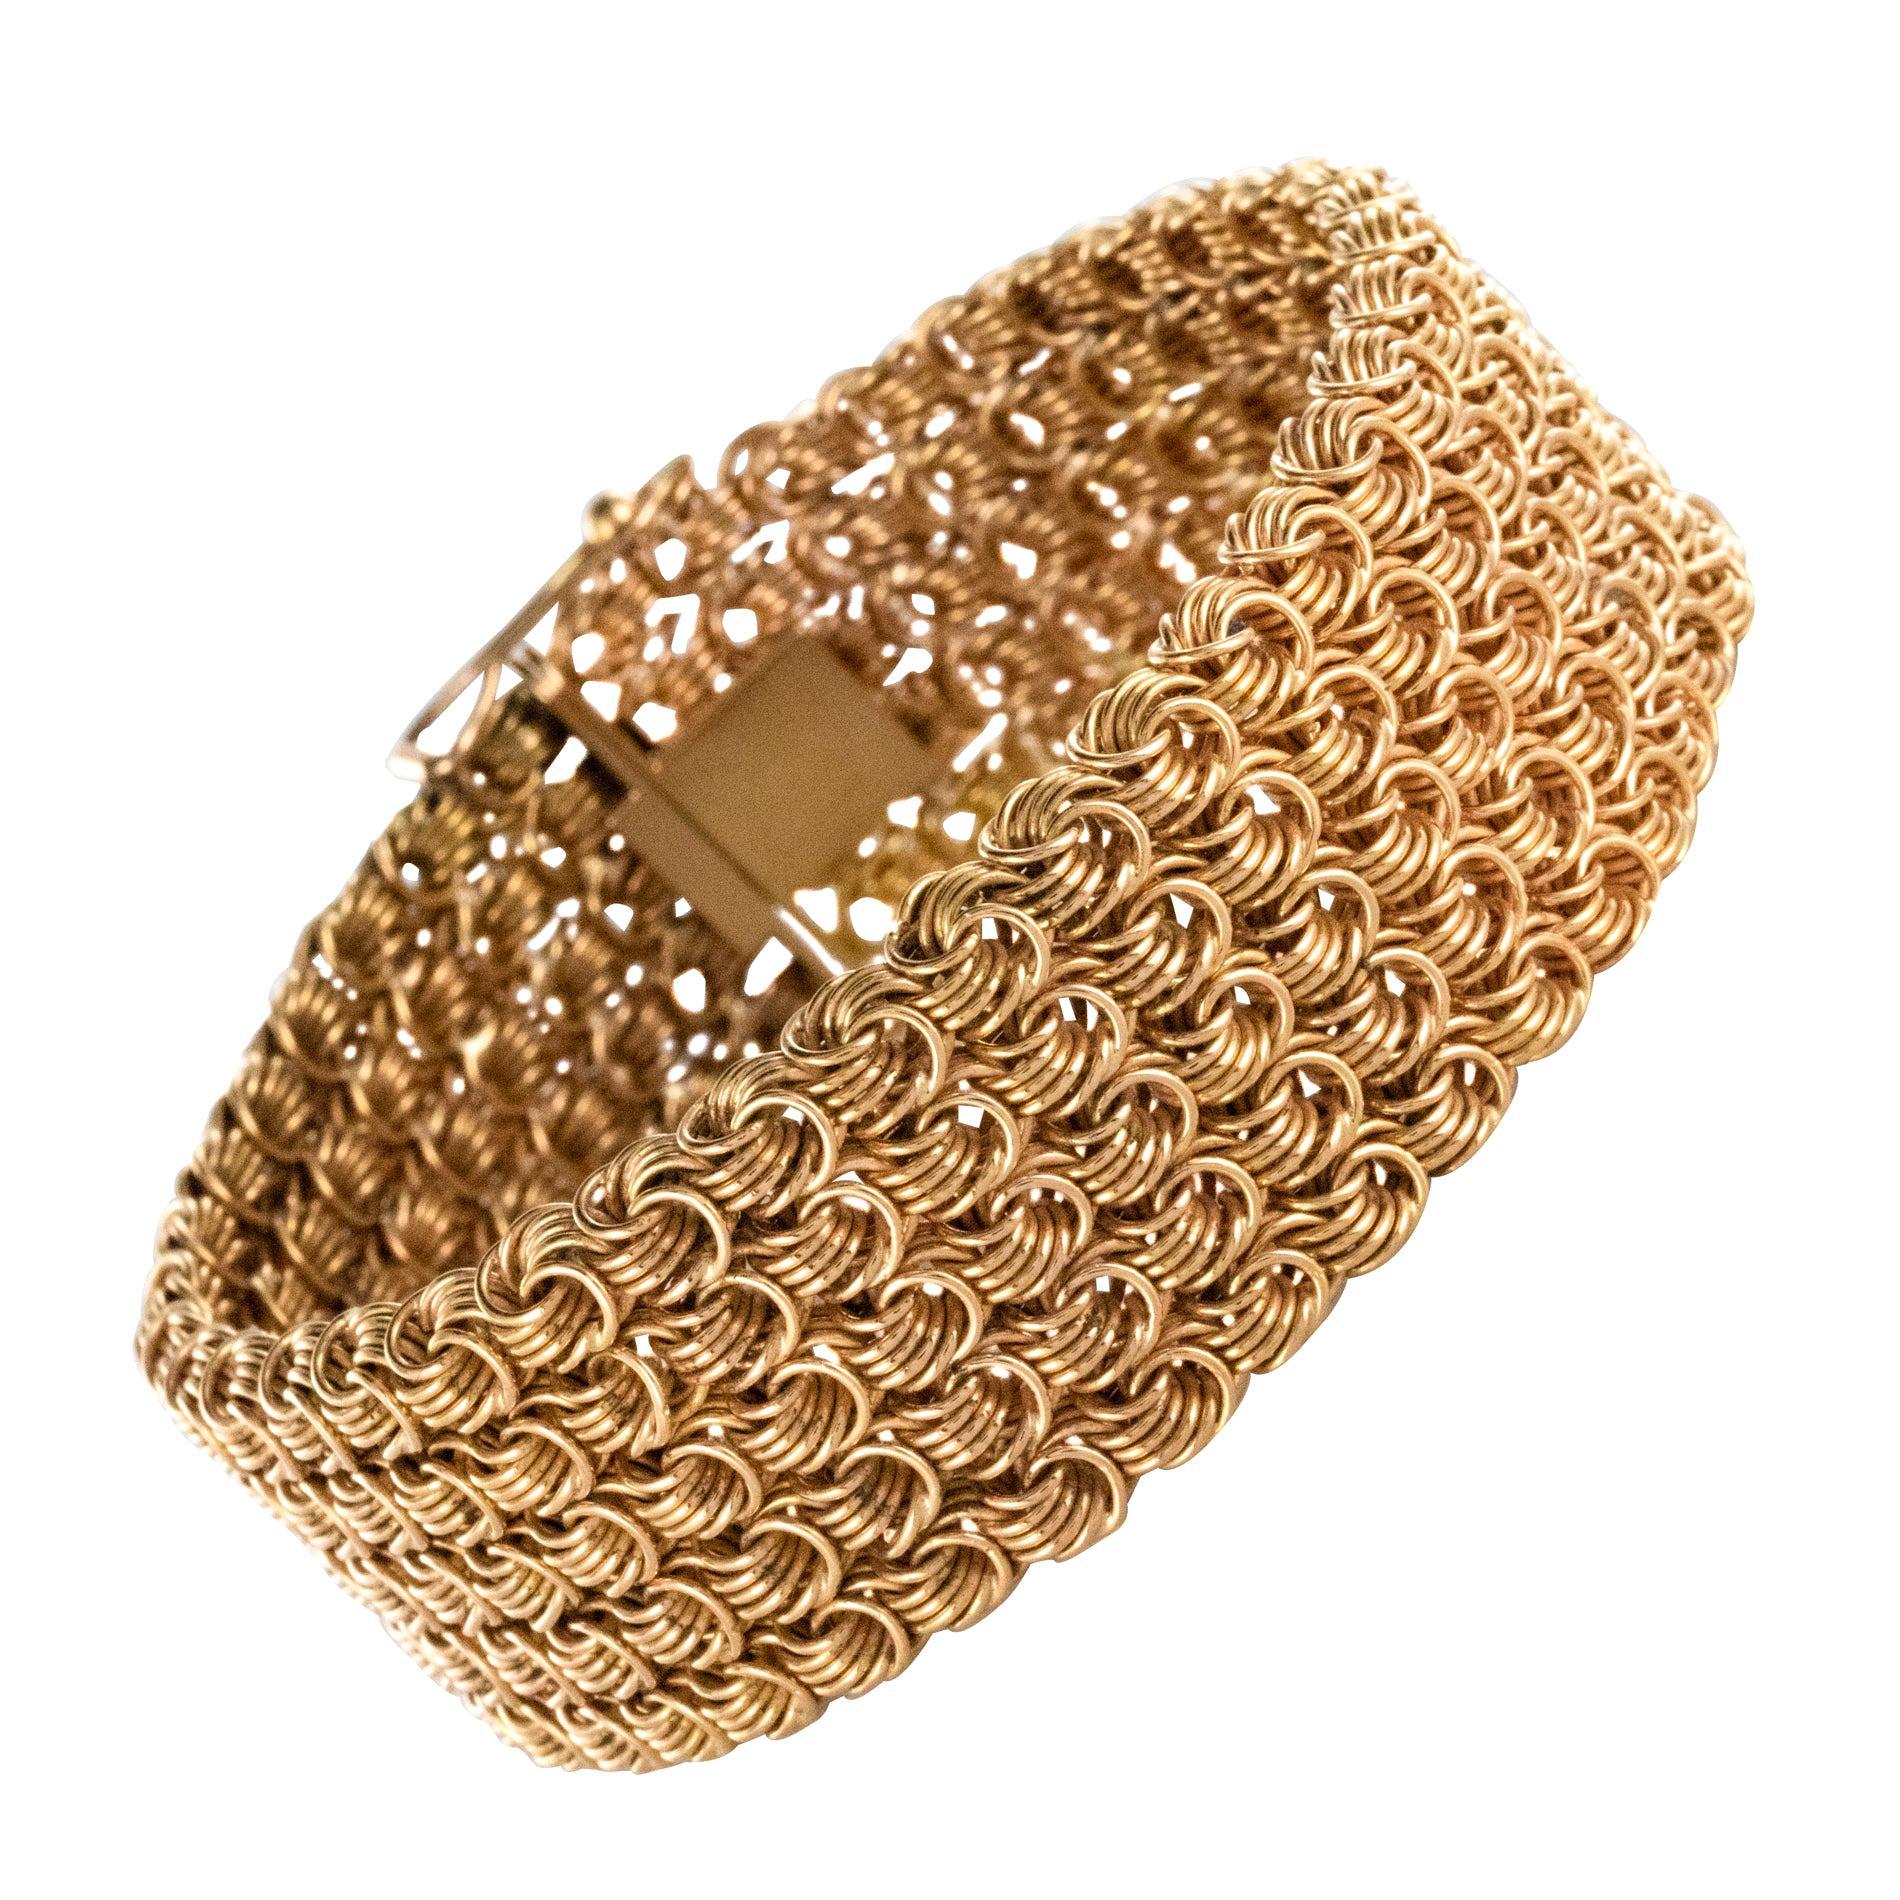 1960s 18 Karat Rose Gold Openwork Woven Mesh Bracelet